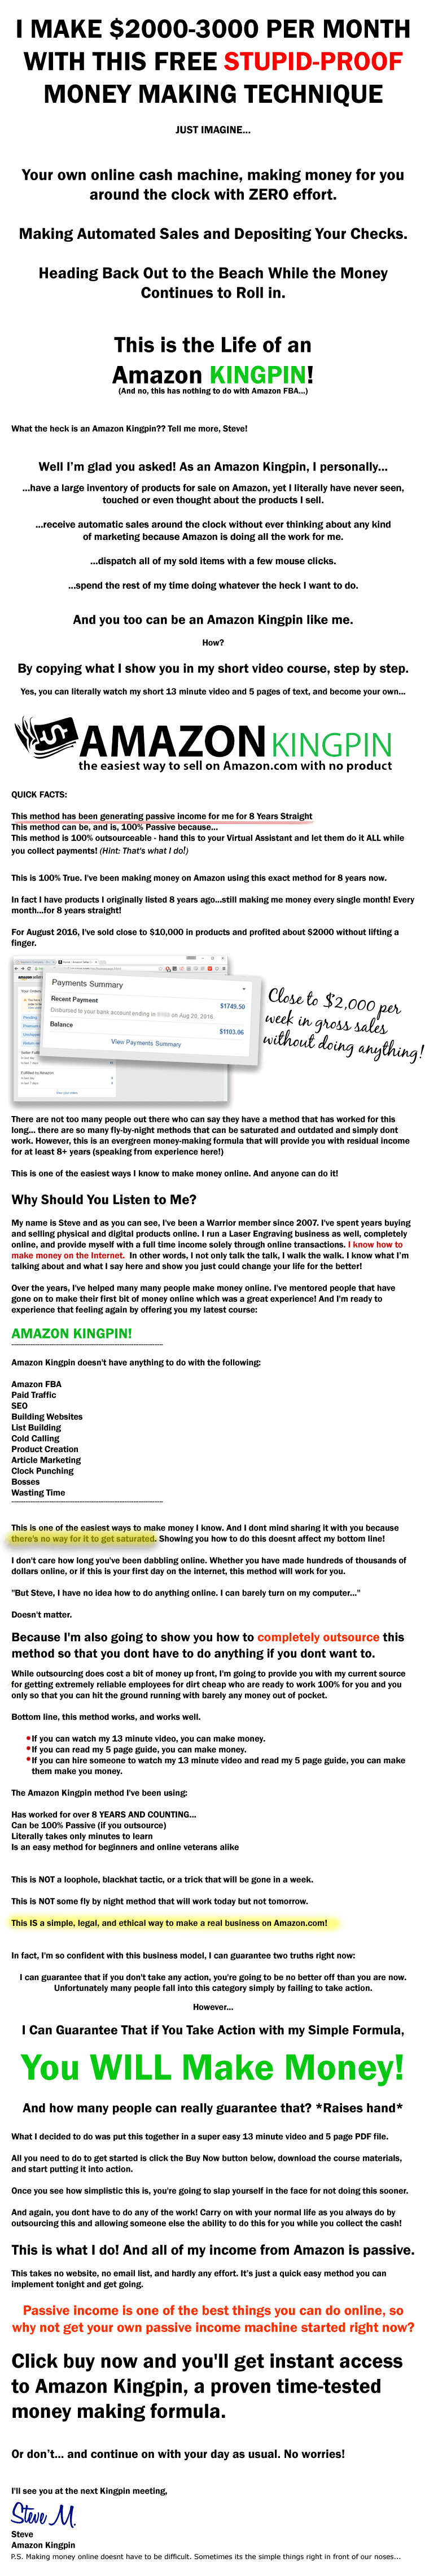 亚马逊上100%外包销售产品每月收入$2000-$3000 (Amazon Kingpin)